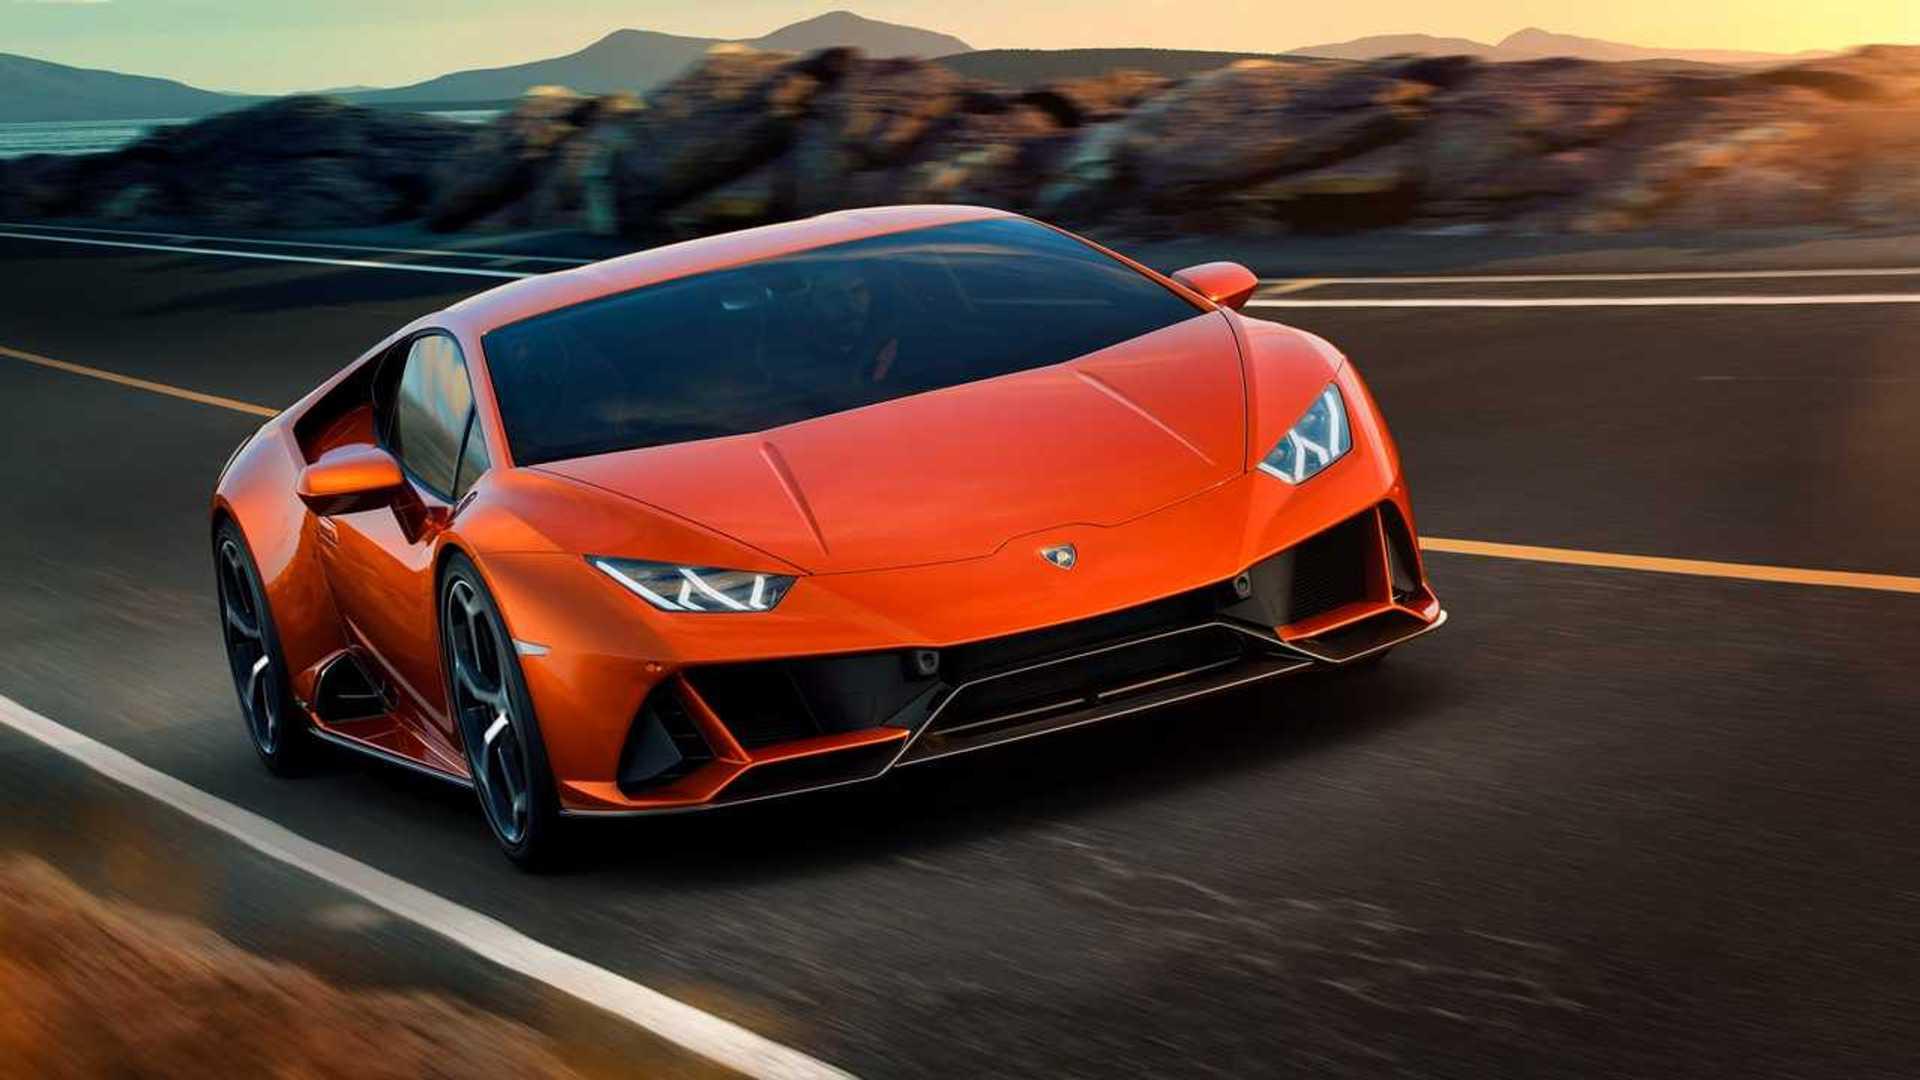 Lamborghini Huracan Evo Spyder Spied On The Highway